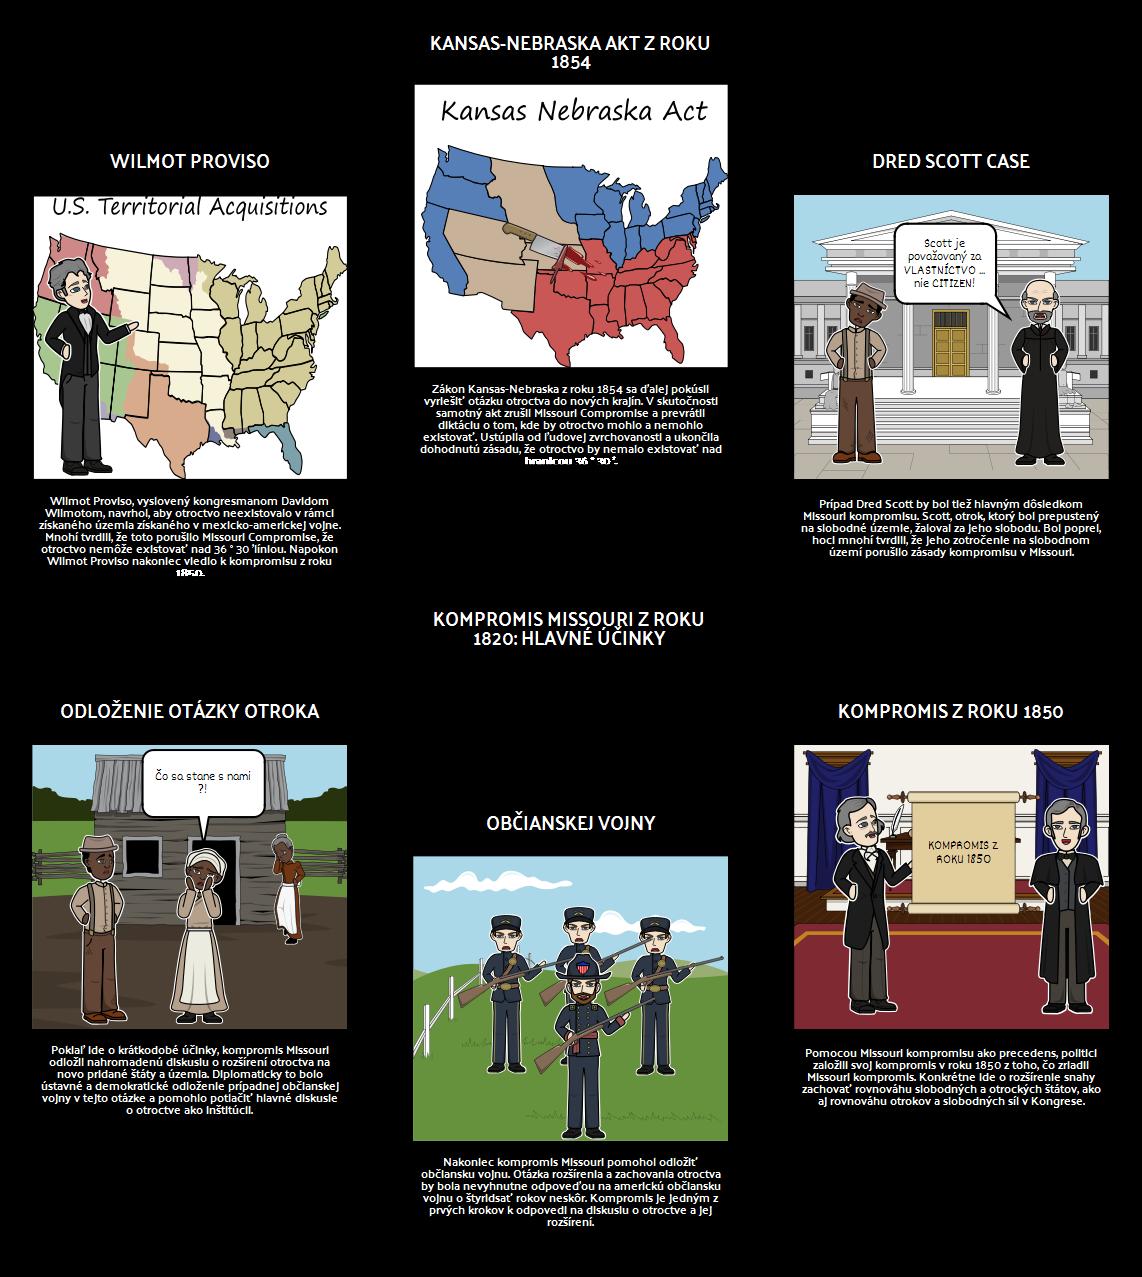 Missouri kompromis z roku 1820 - hlavné efekty